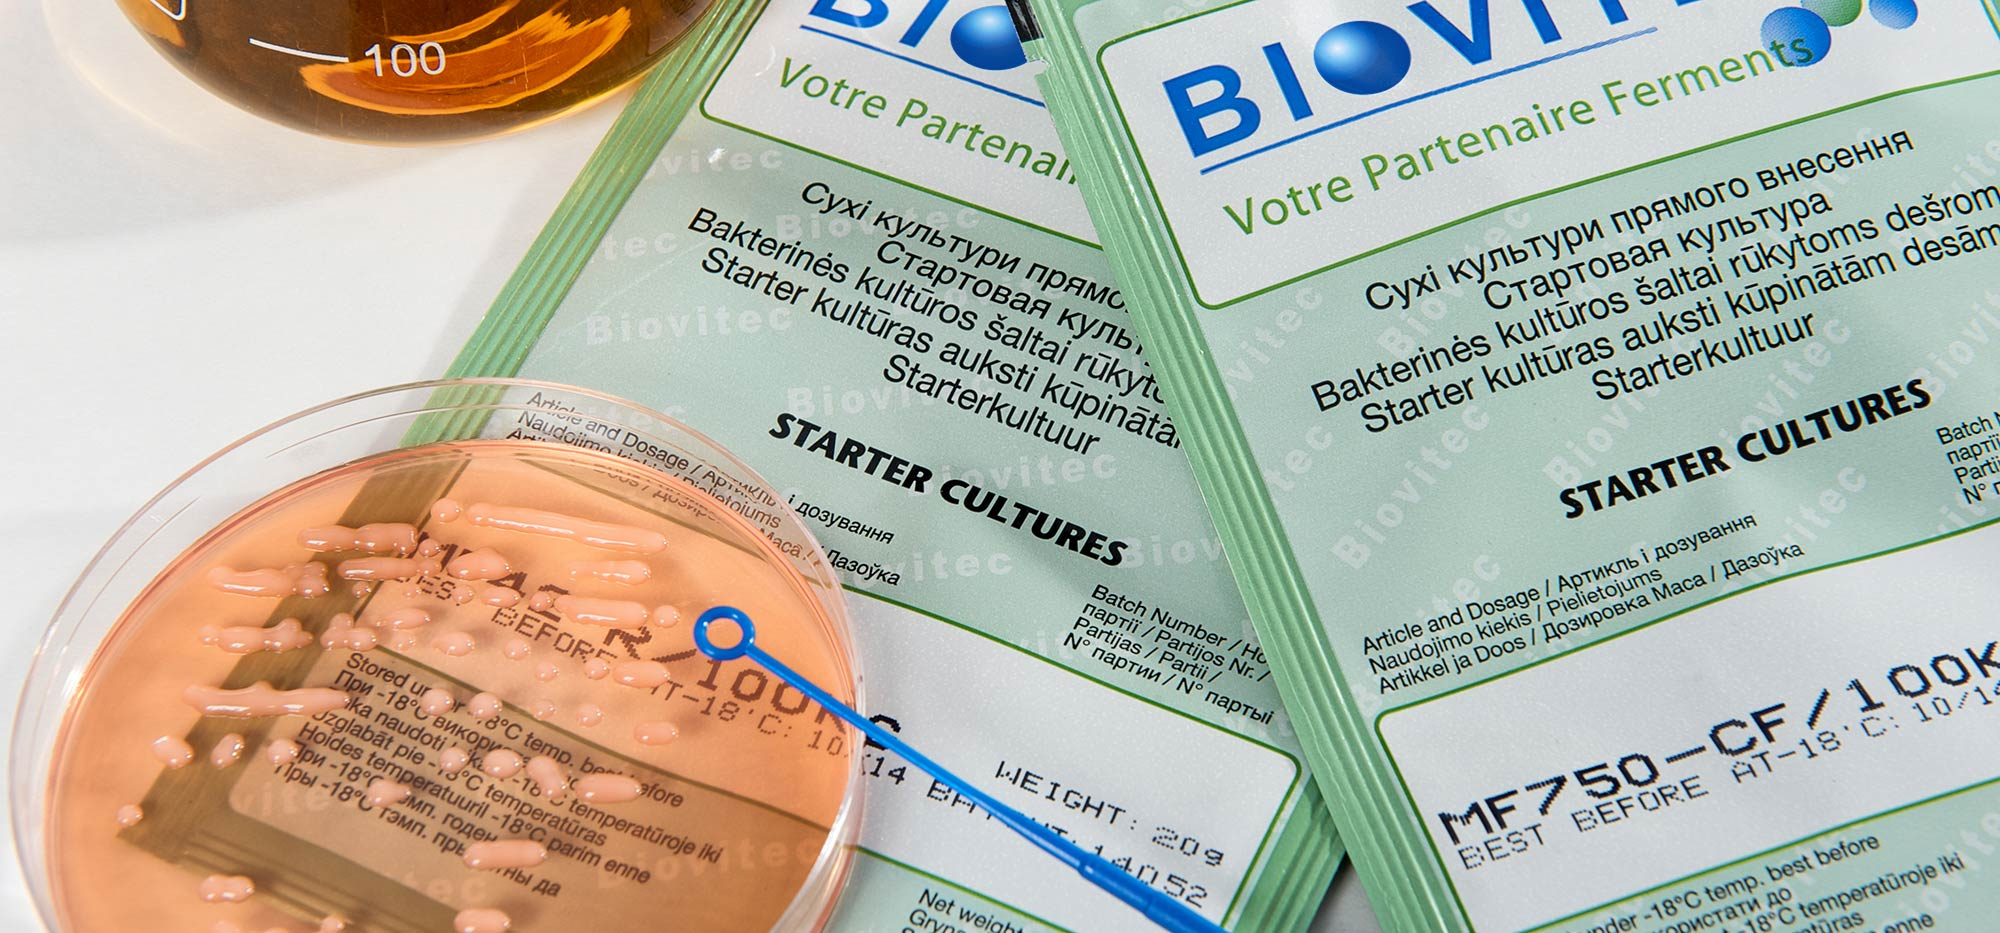 product-commitments_biovitec3